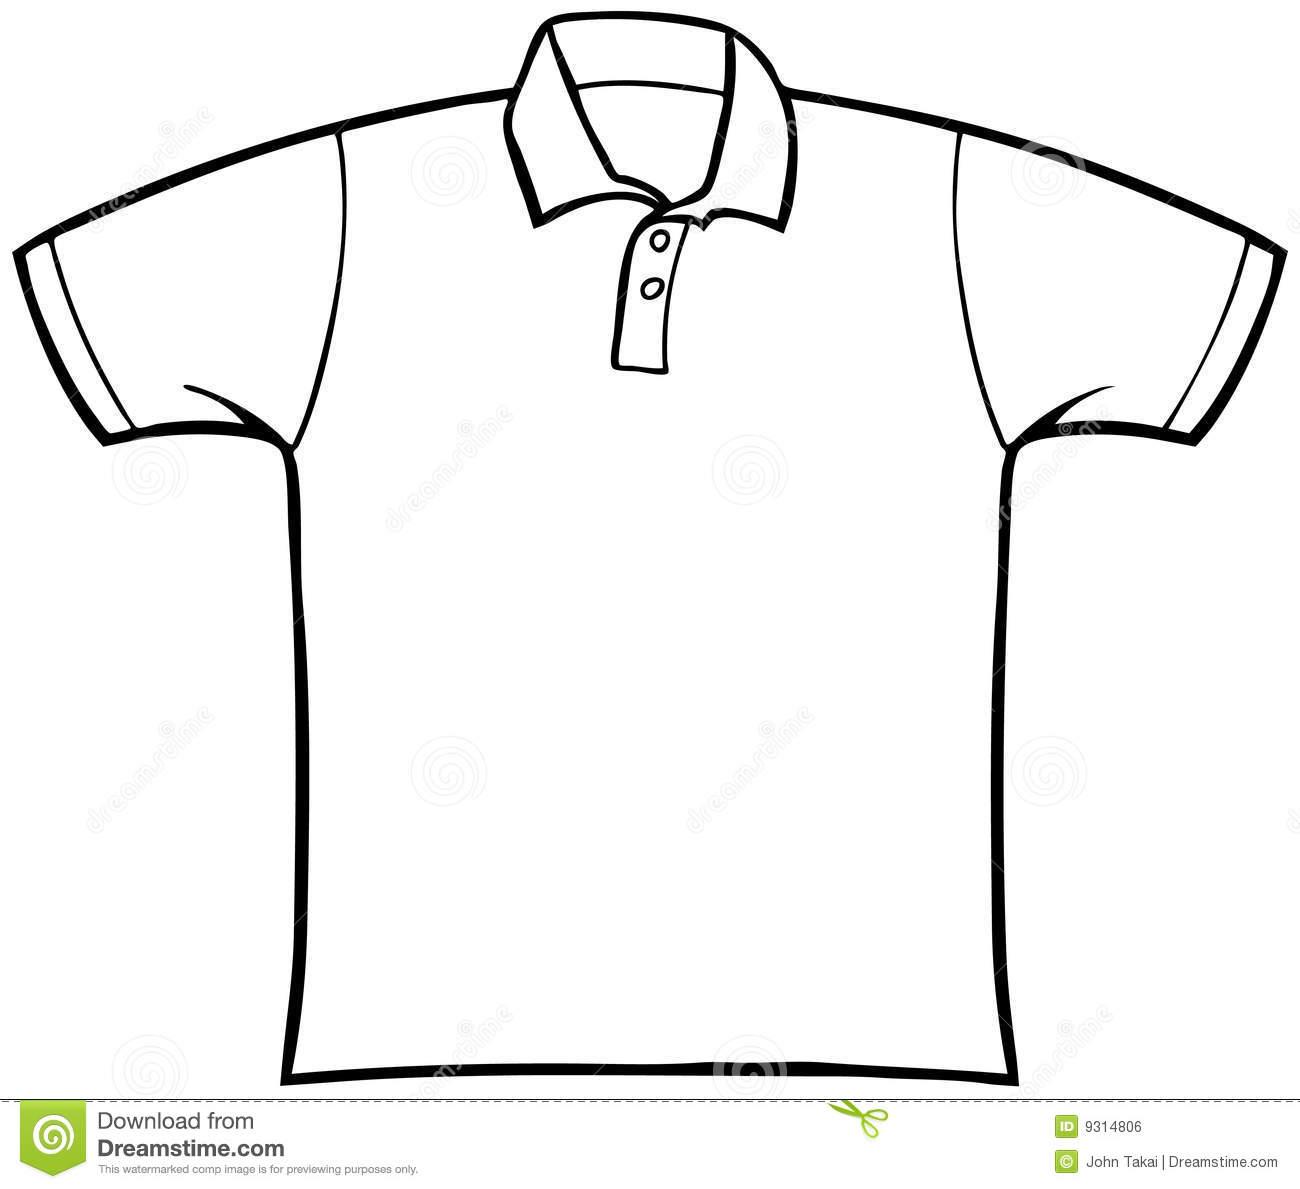 Suit clipart shirt collar Panda Clothes Images Free Clipart